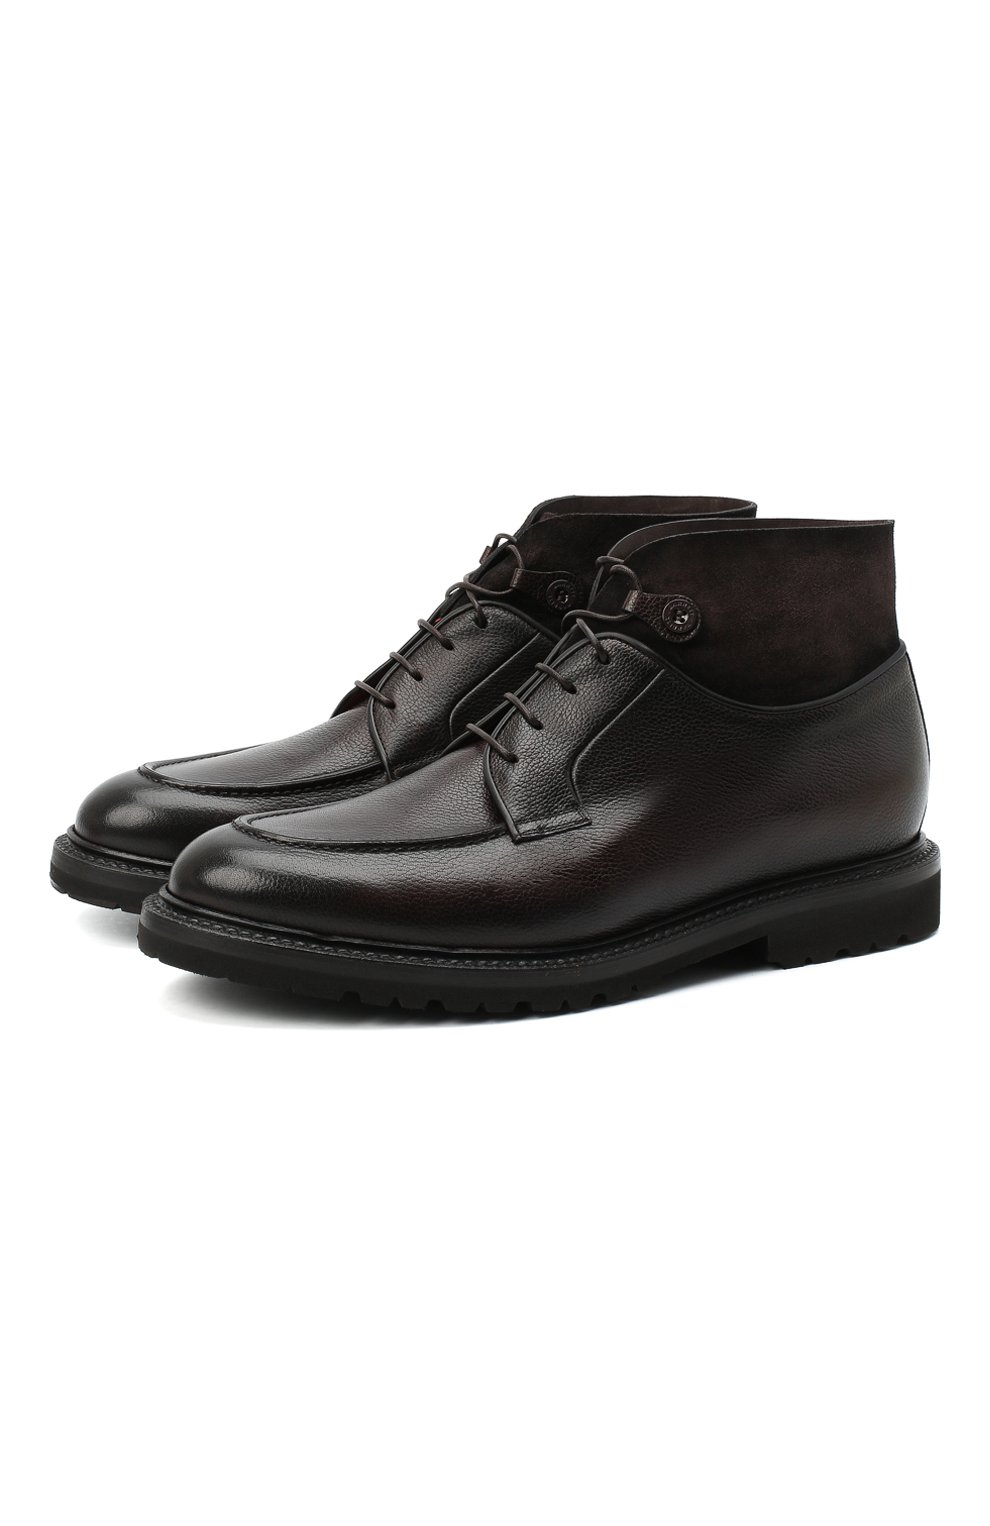 Мужские кожаные ботинки BARRETT темно-коричневого цвета, арт. 192U026.8/RAIDER   Фото 1